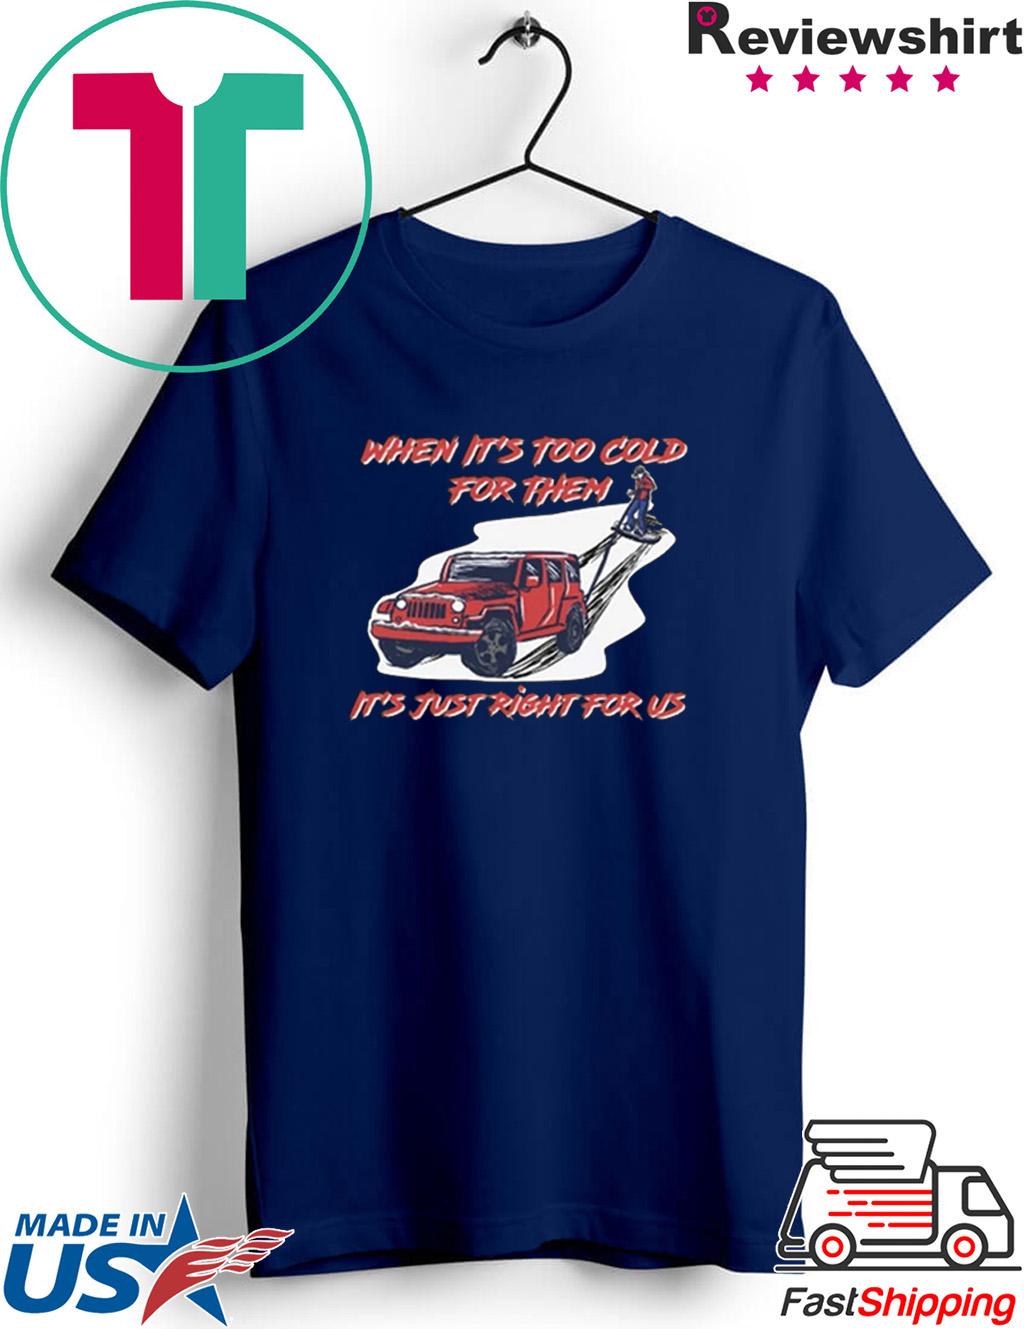 05th Anniversary Outlander Signature Shirt tank top